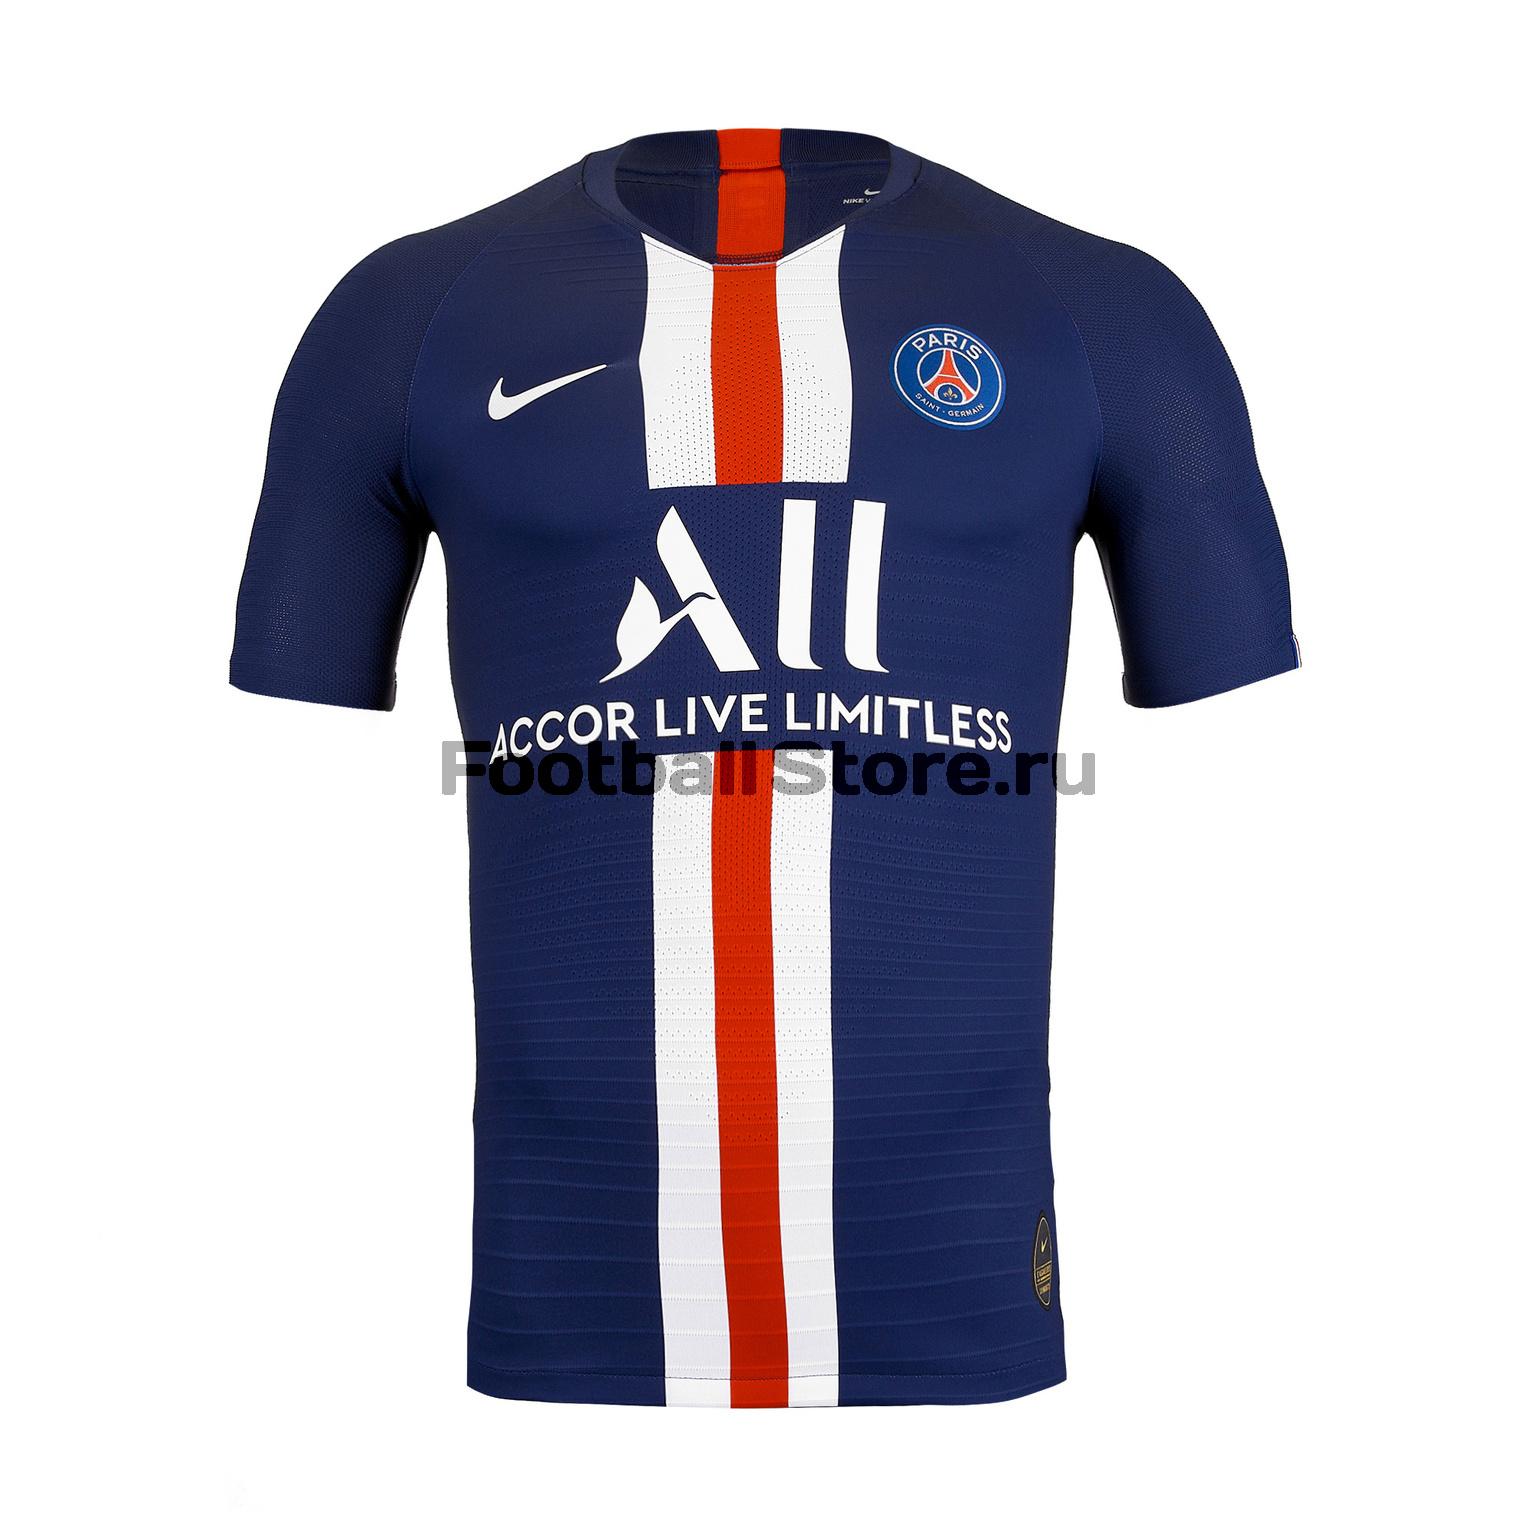 Оригинальная домашняя футболка Nike PSG 2019/20